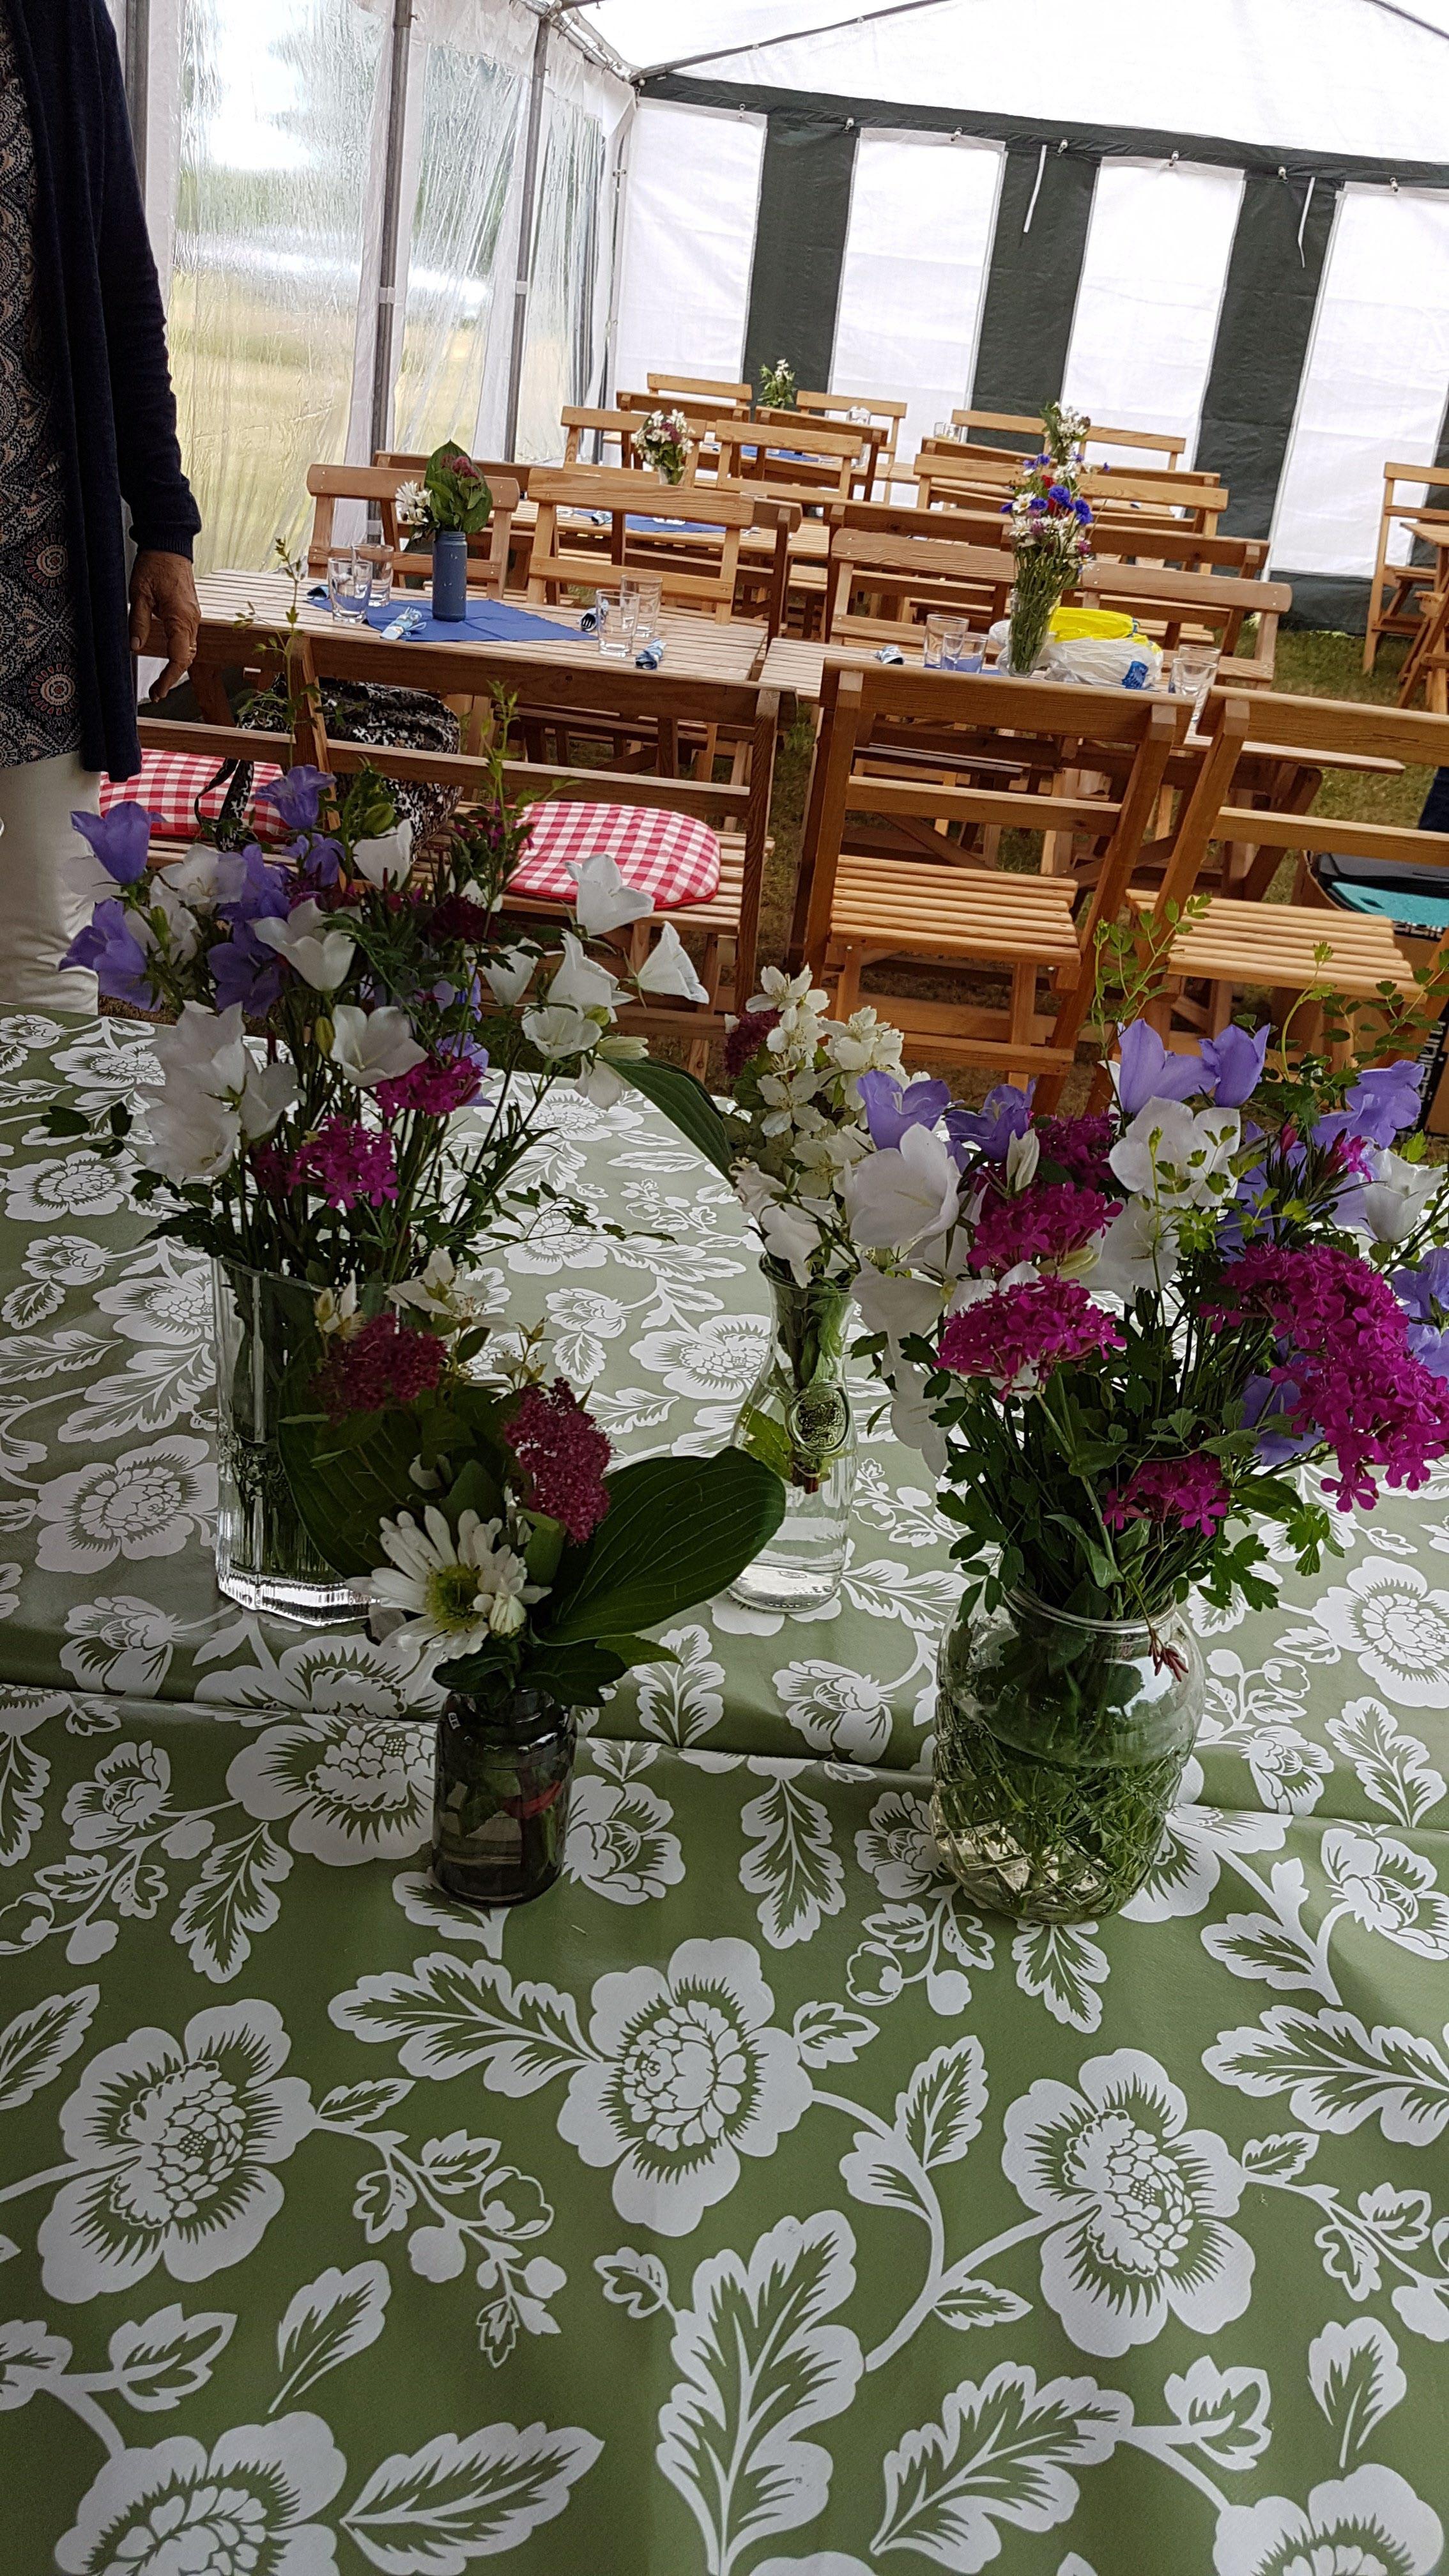 Vackert dukade bord